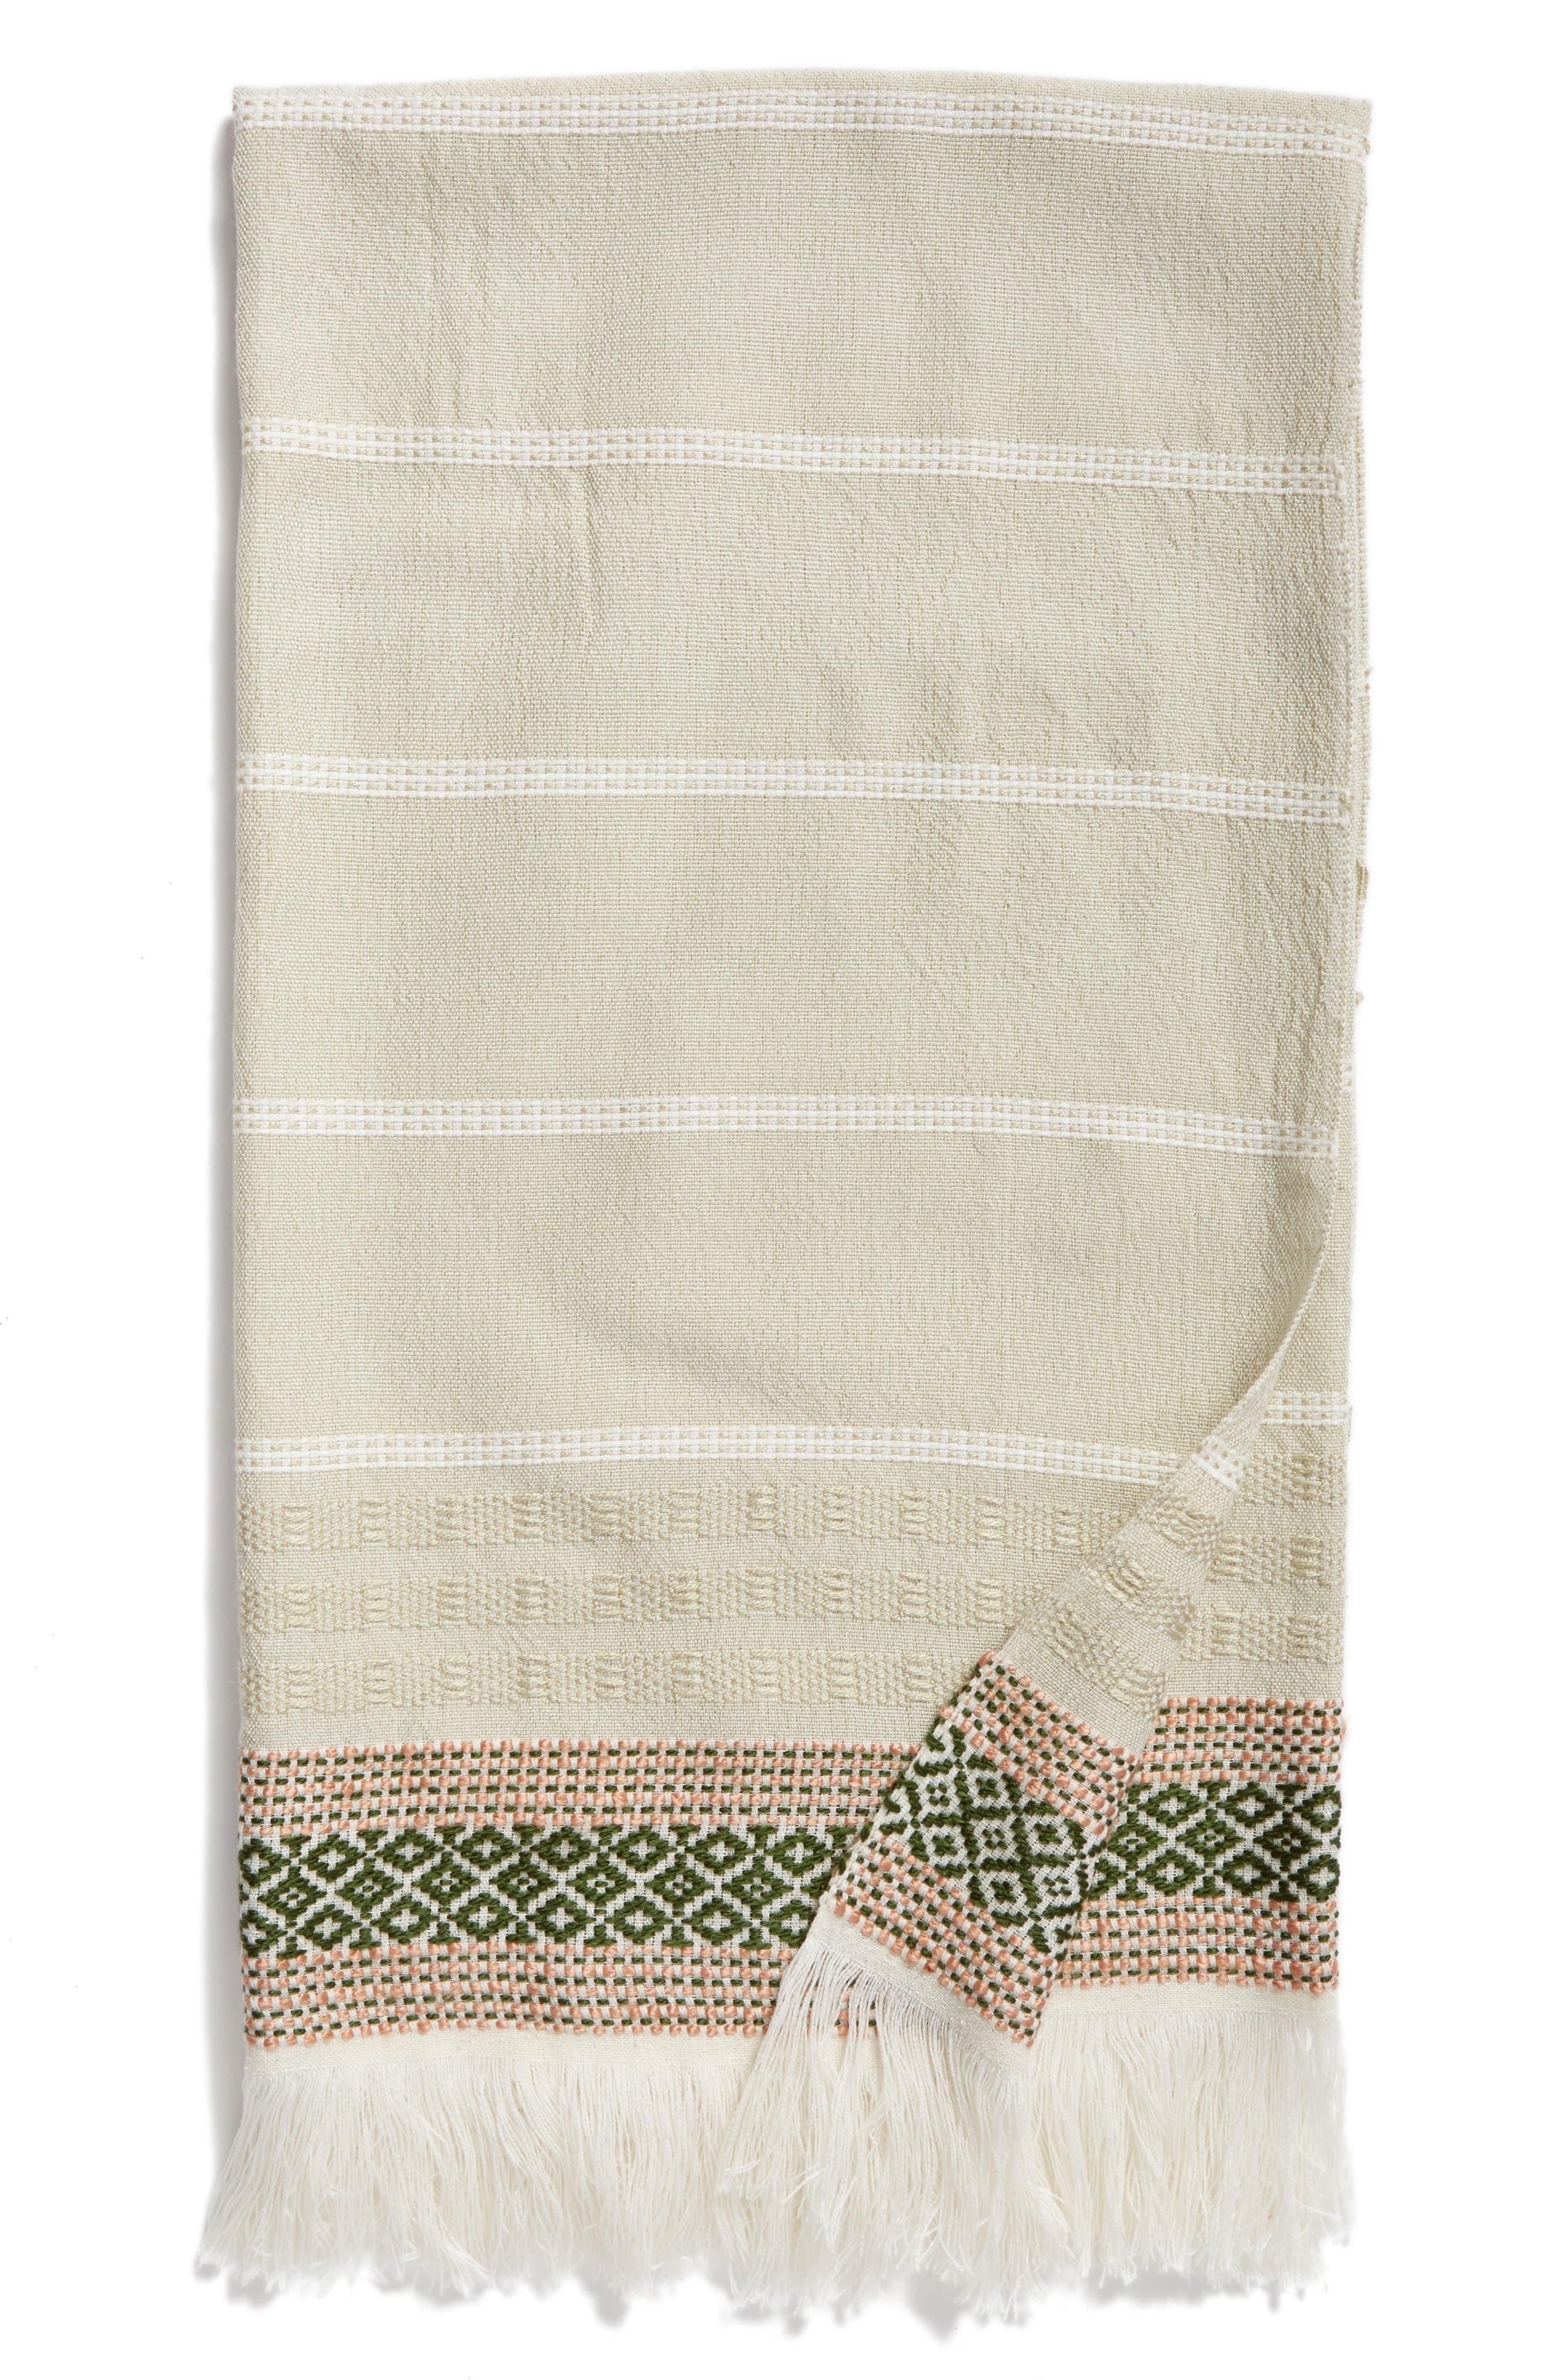 Nordstrom at Home Stripe Throw Blanket